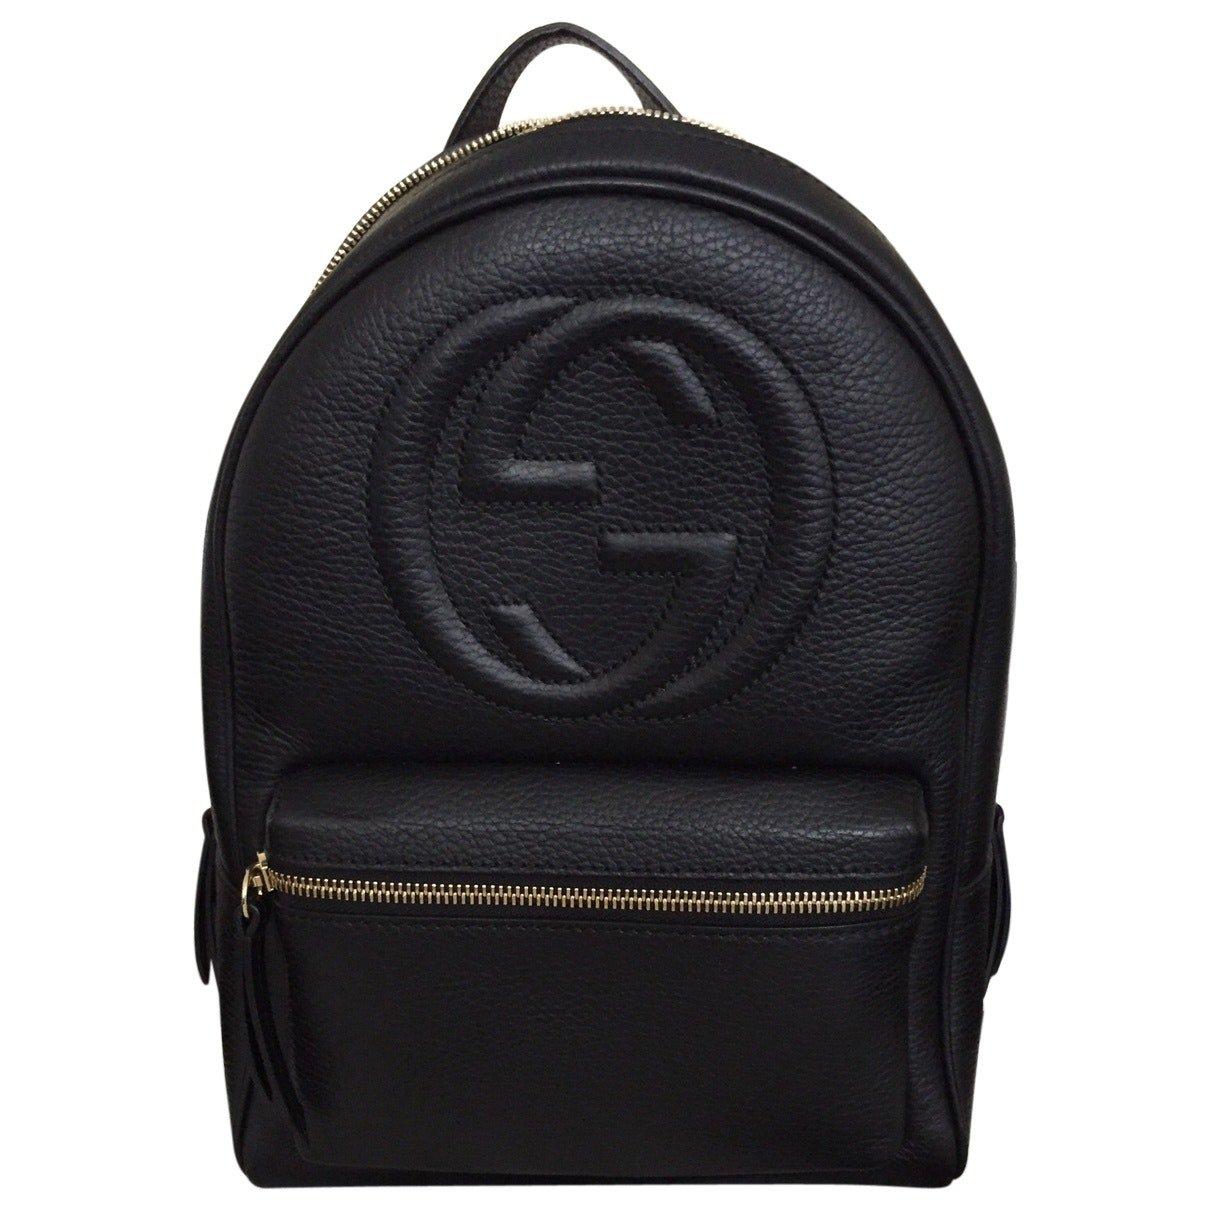 1e3a8bd0de80ef Amazon.com: Gucci Soho Black Backpack Calf Leather Backpack Ladies Bag  Italy New : Shoes